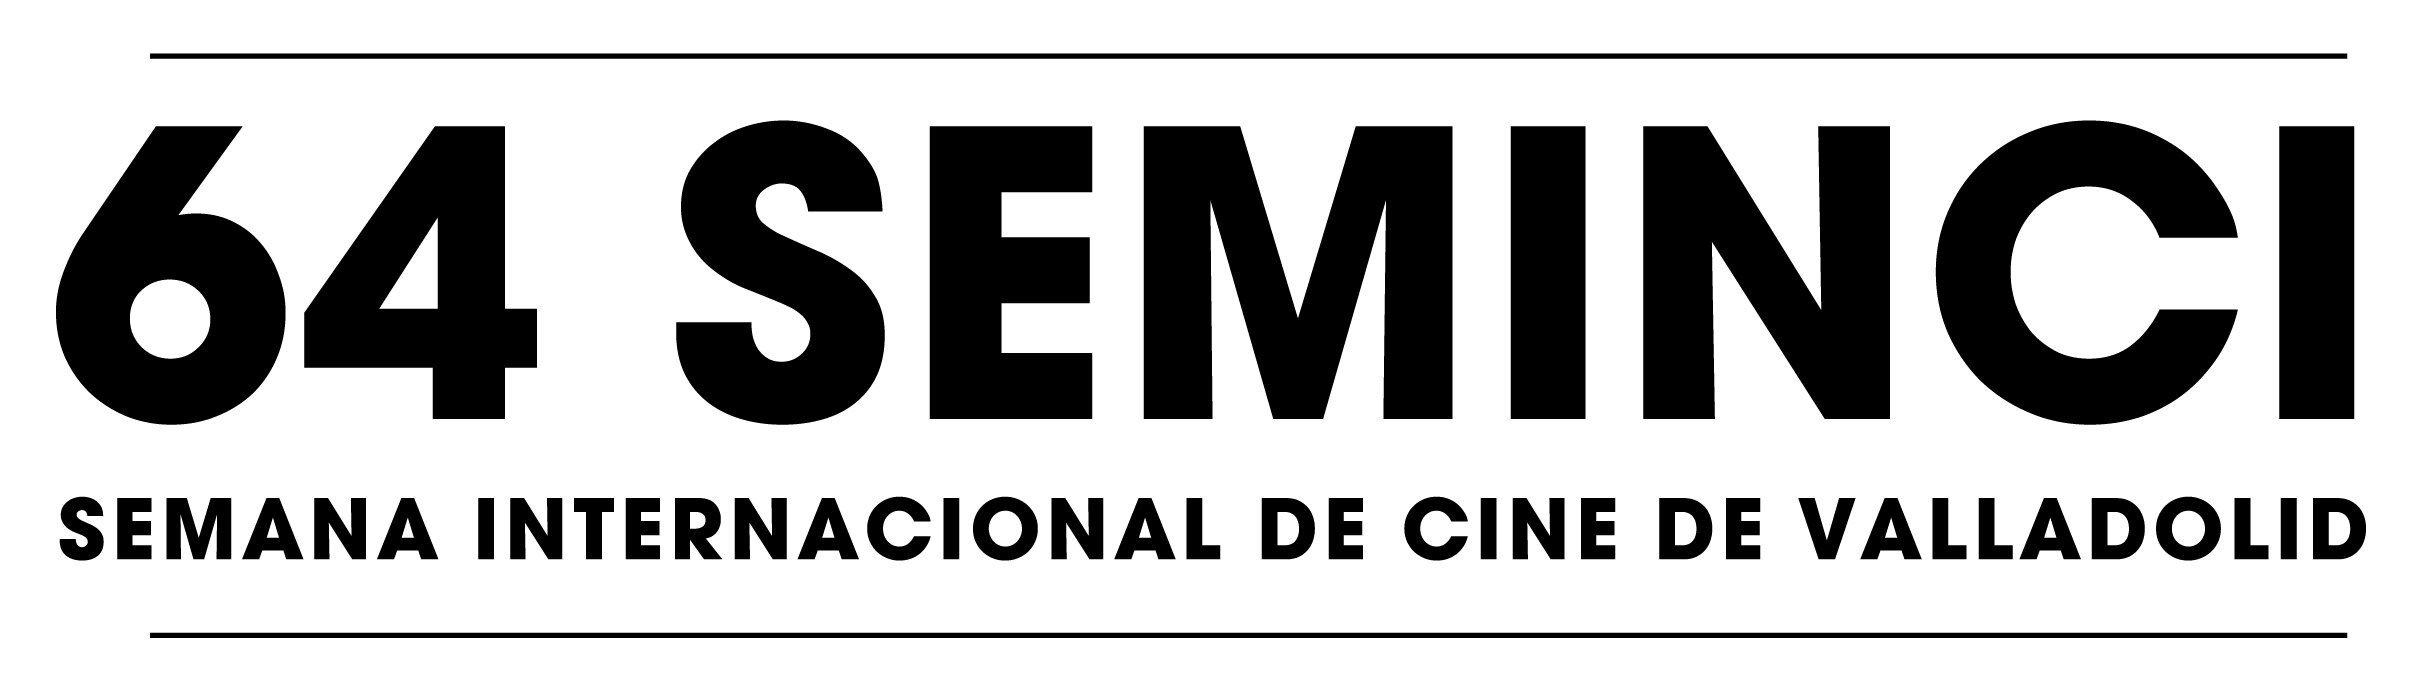 seminci2-01.jpg